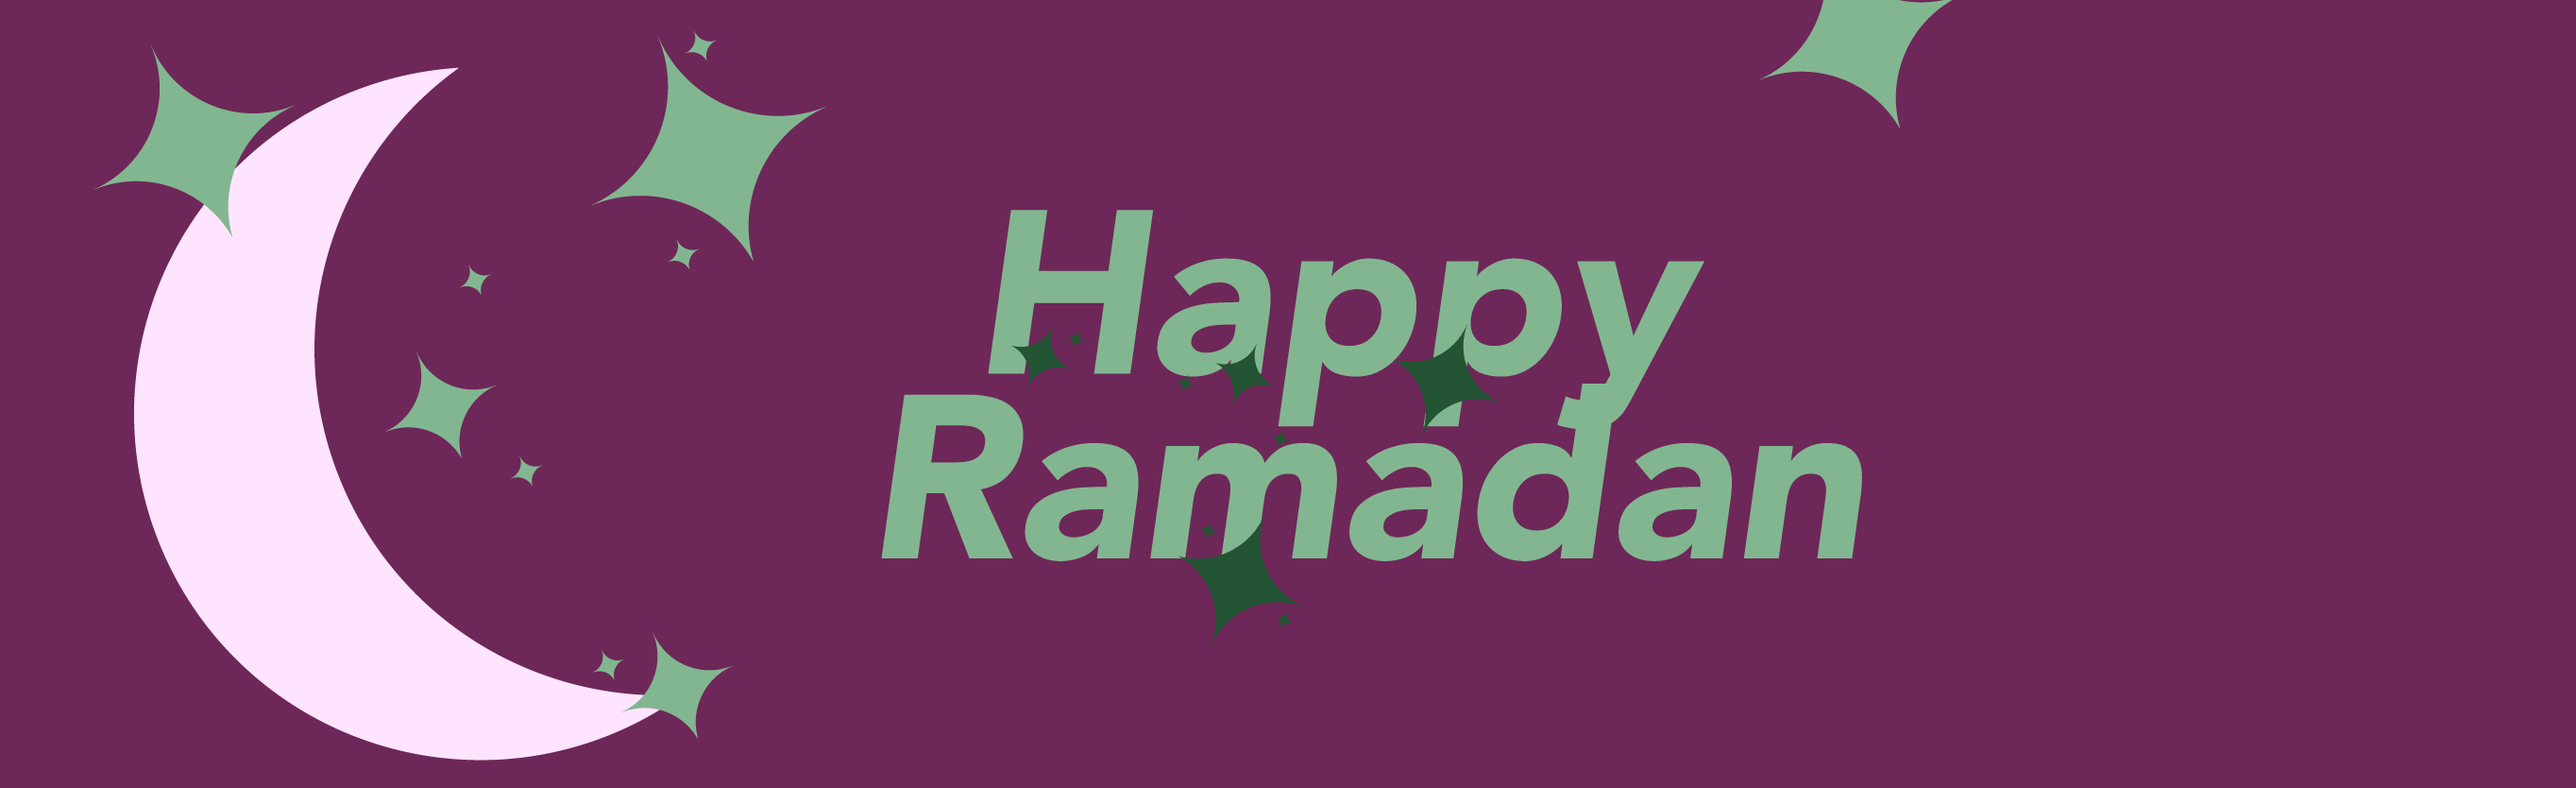 Ramadan Page image CWC